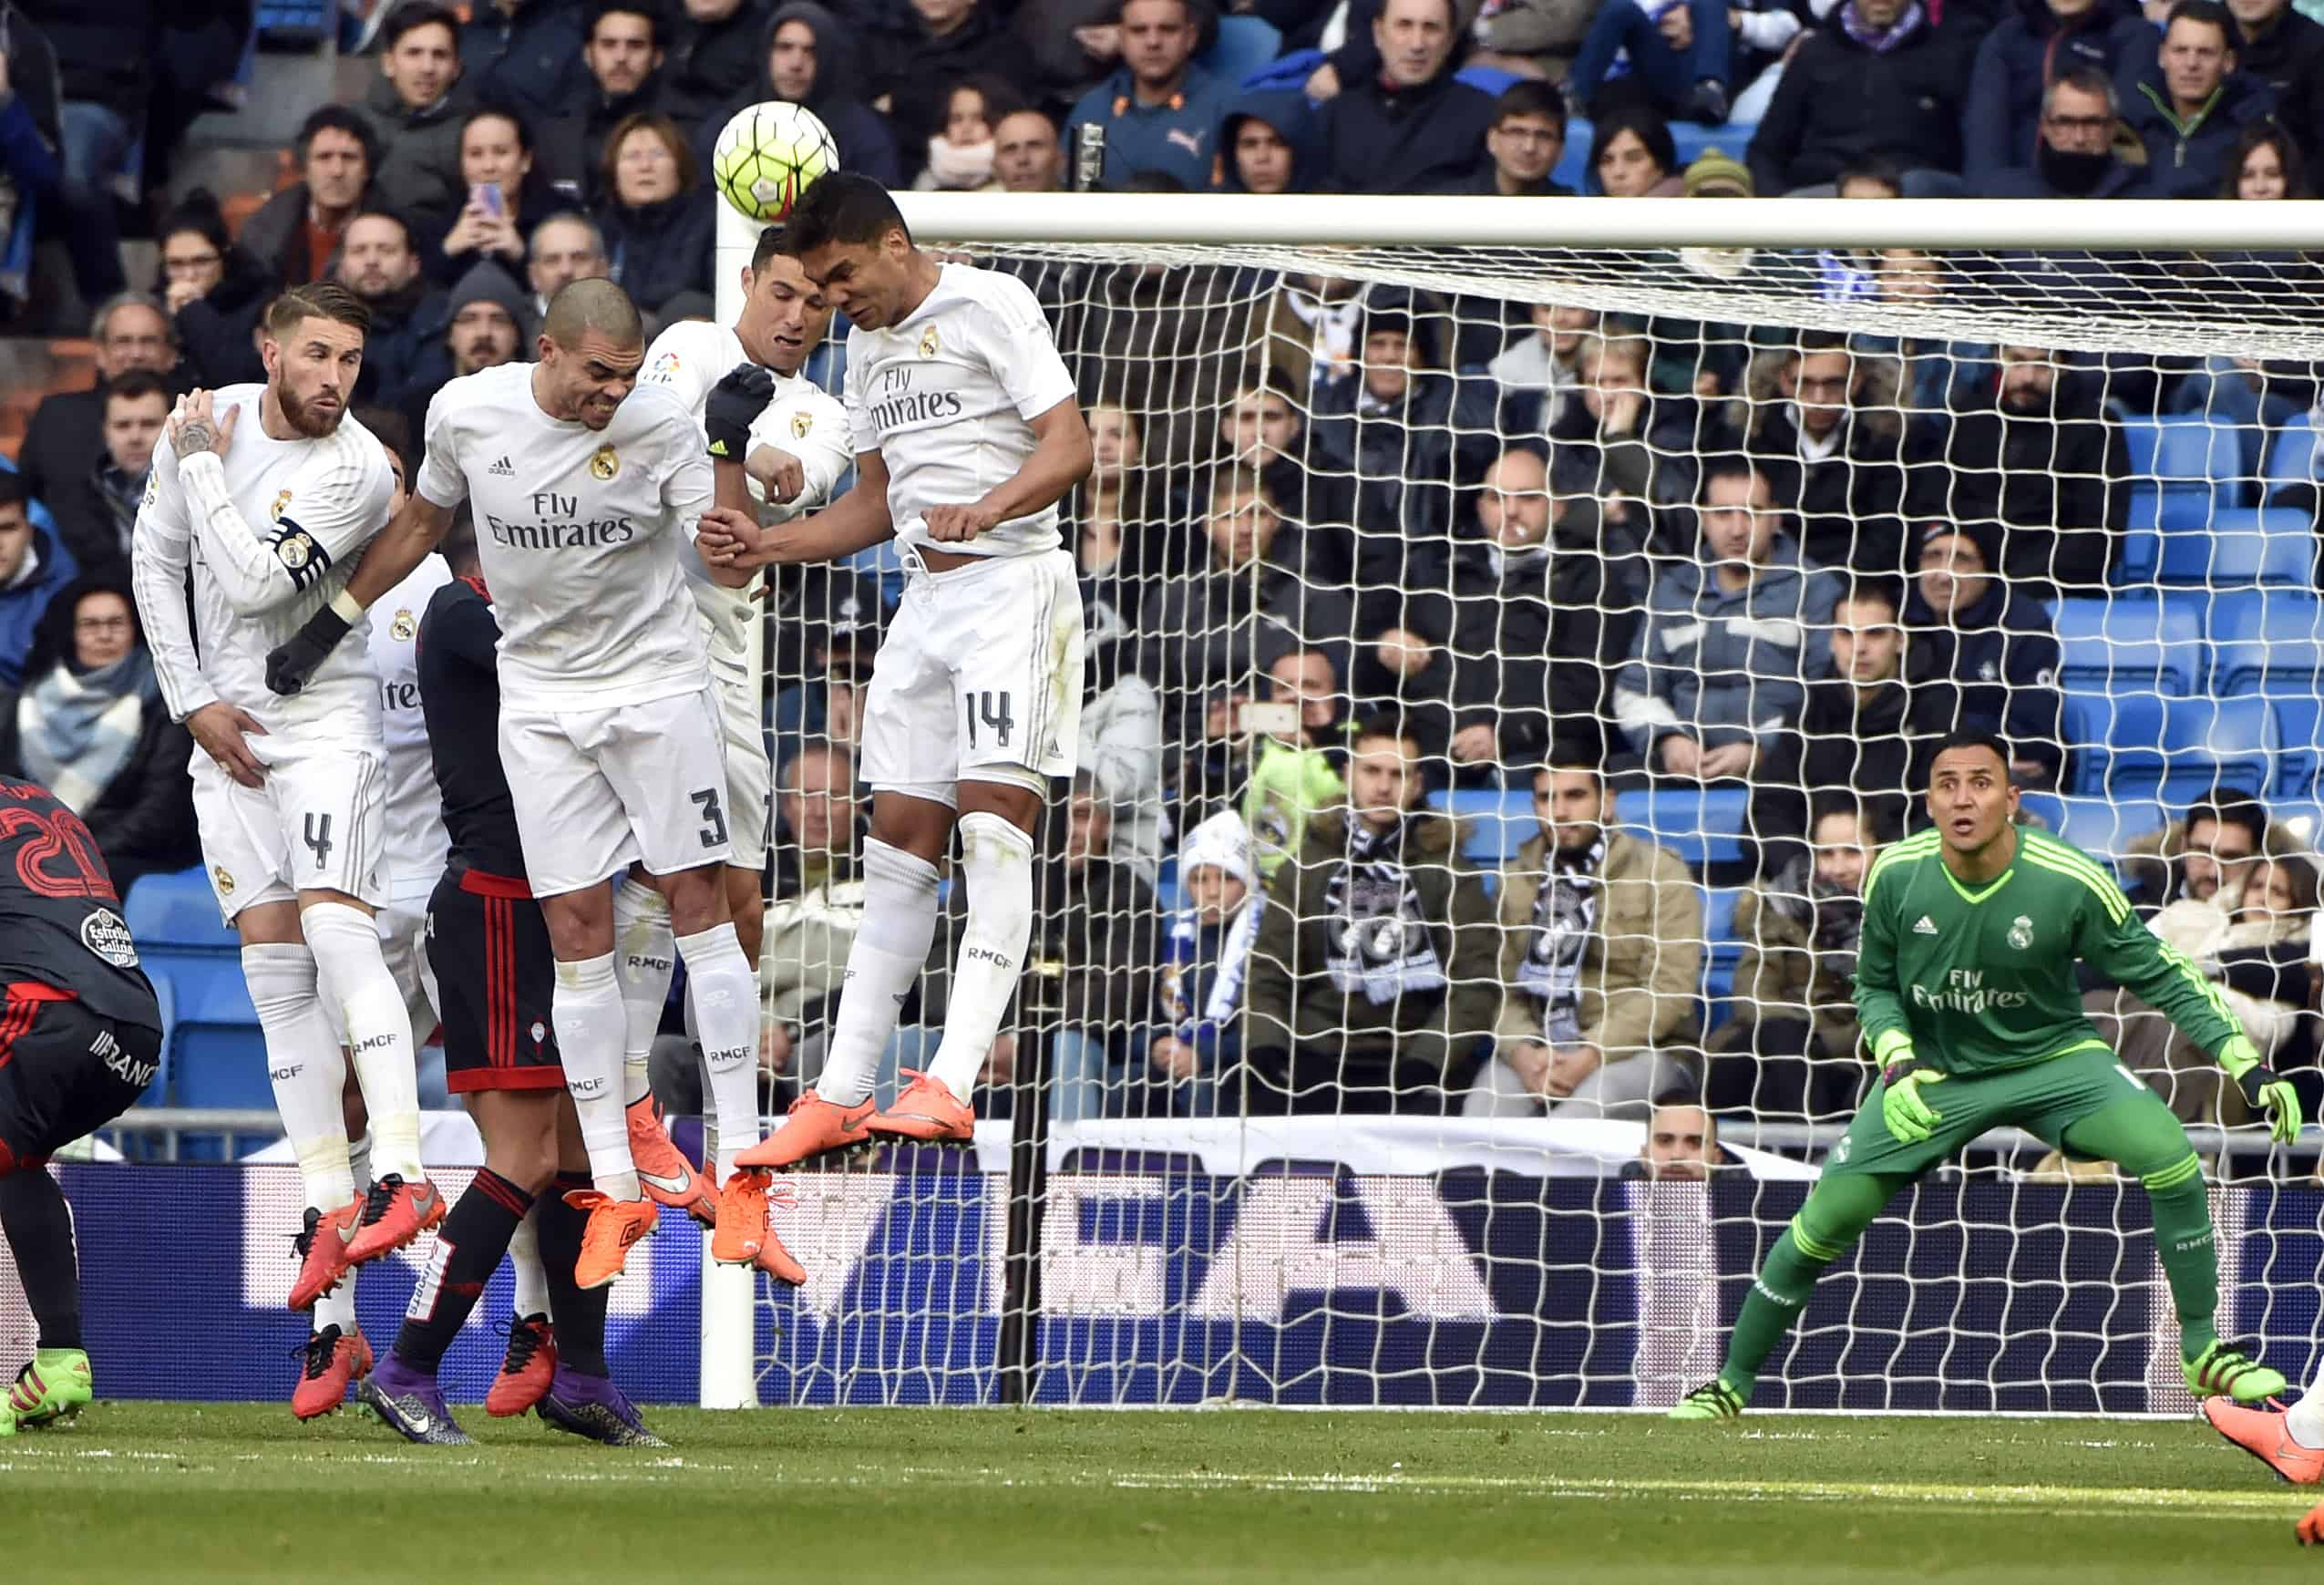 Keylor Navas penalty kick save